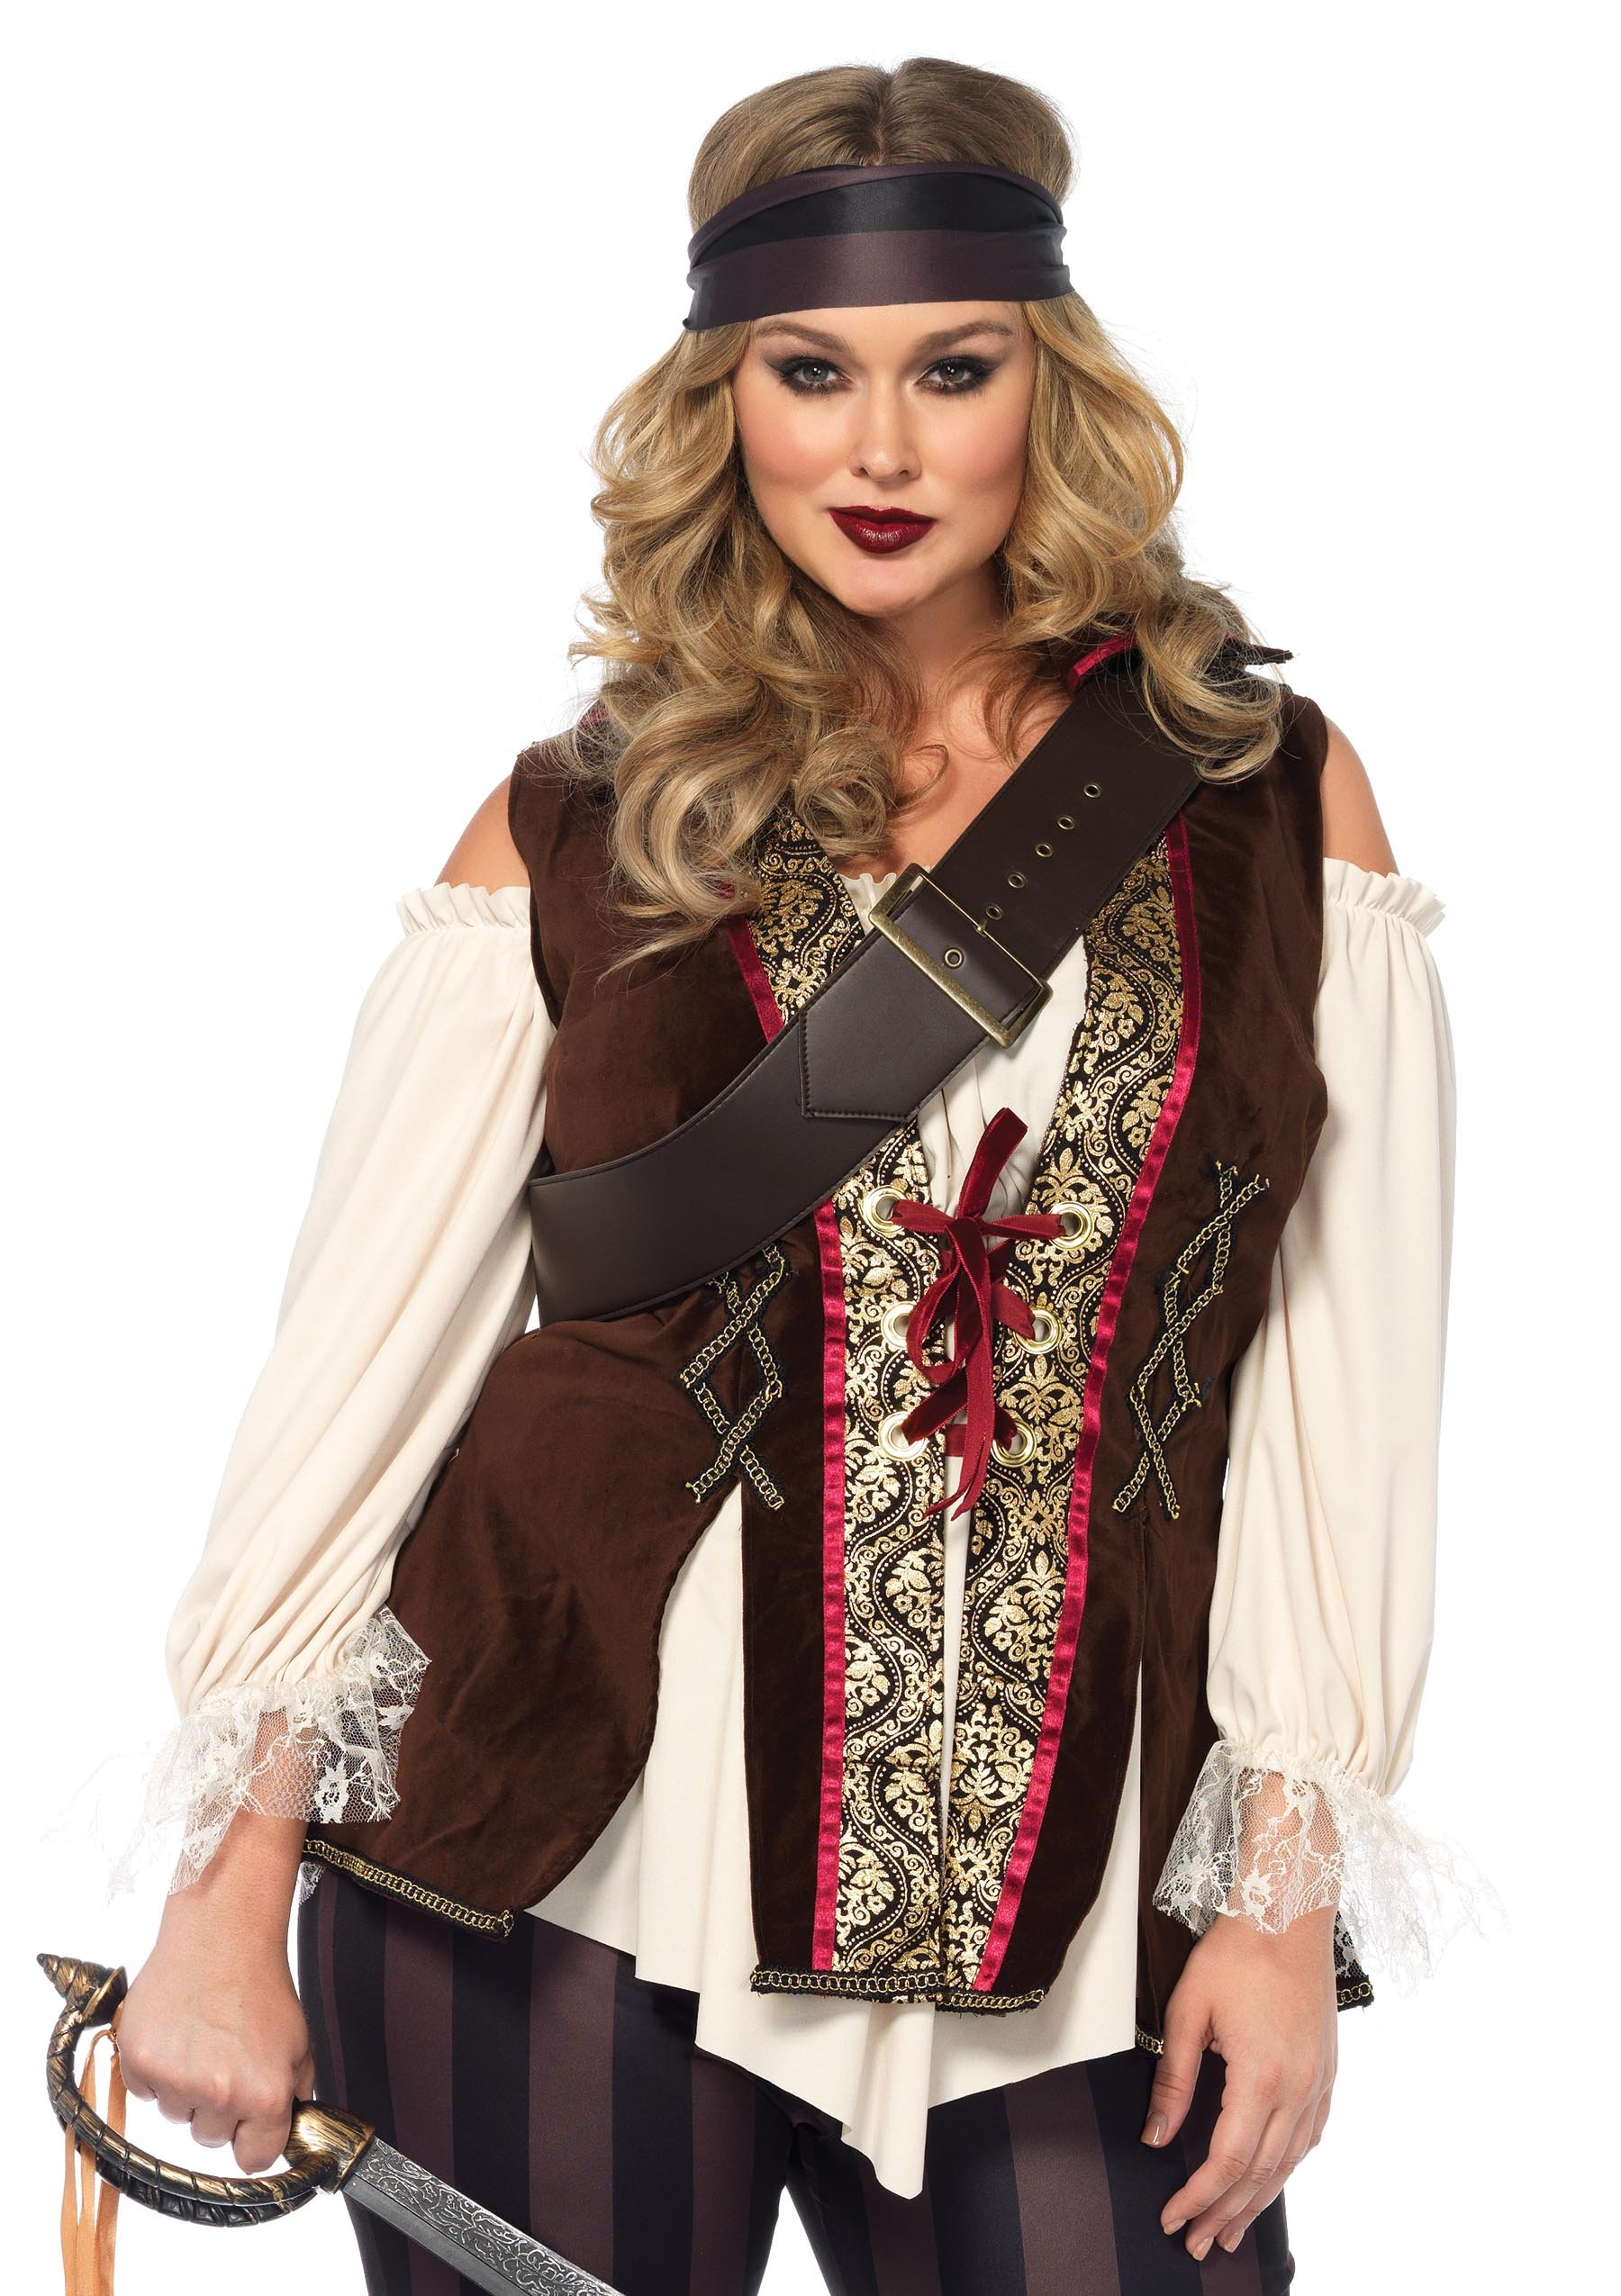 Leg Avenue Women's Plus Size Captain Blackheart Costume, Multi, 1X-2X